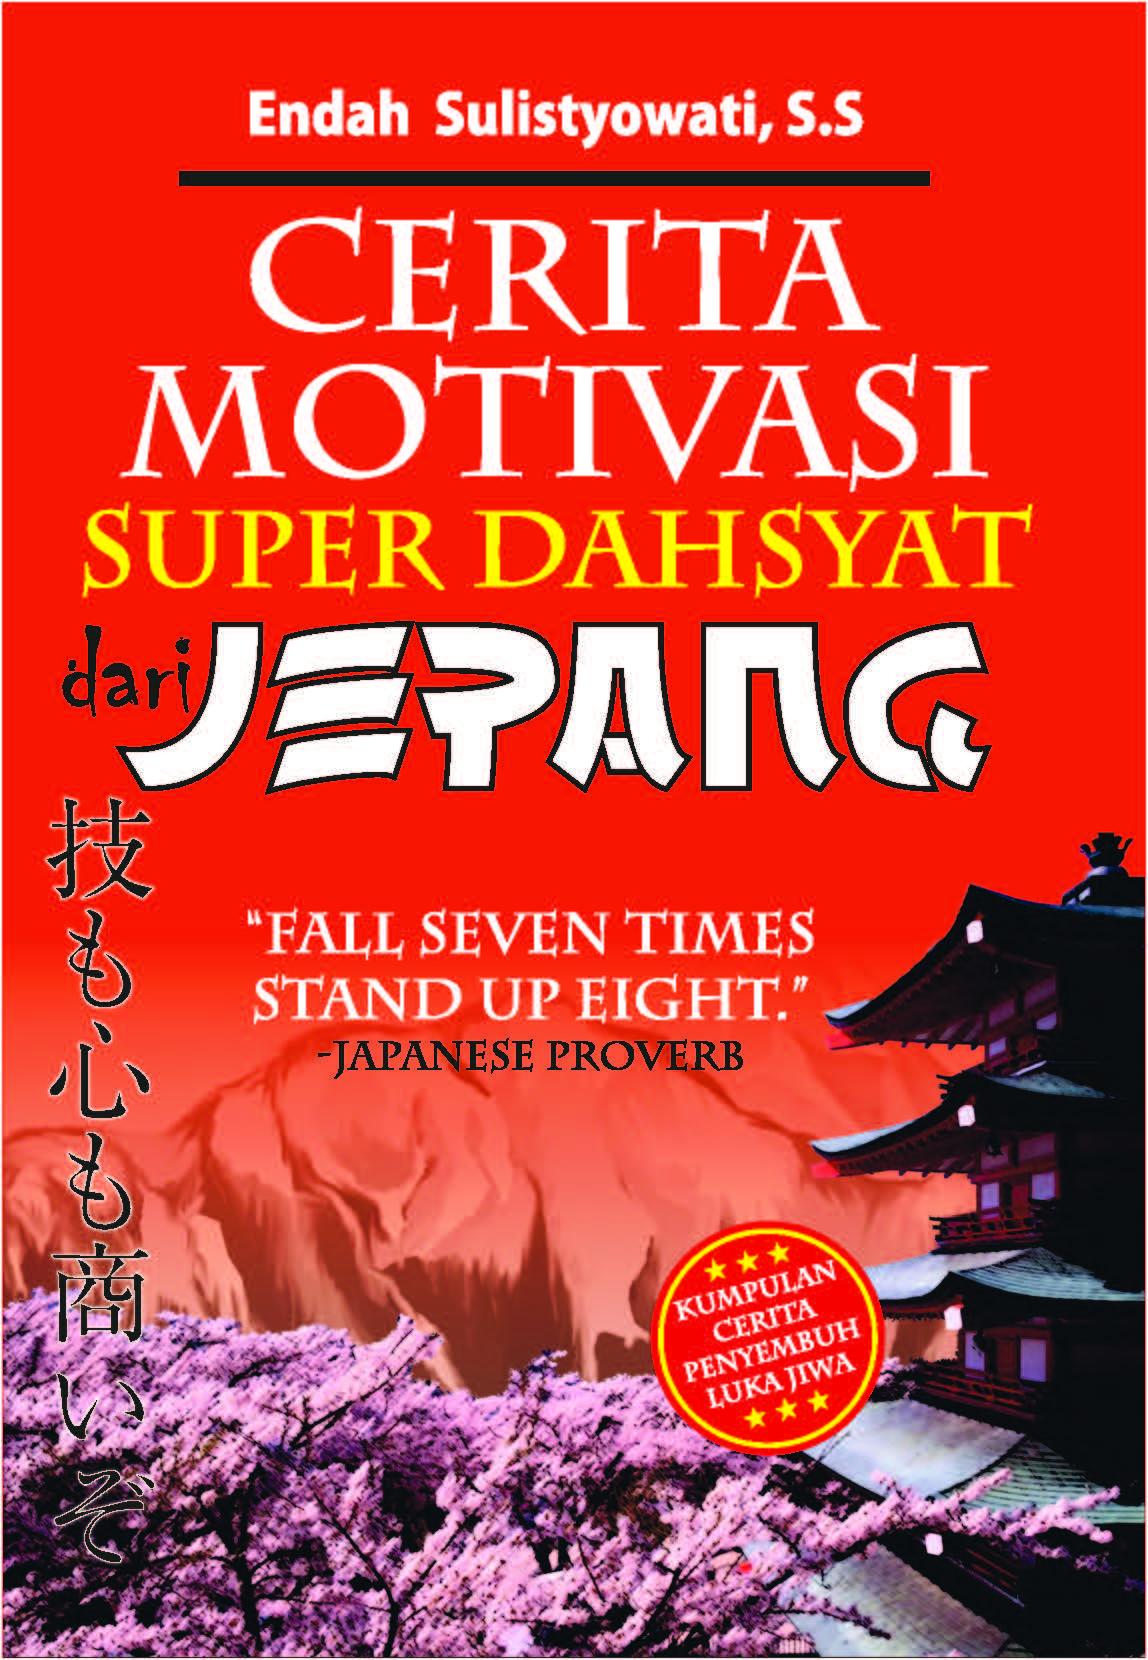 Cerita motivasi super dahsyat dari Jepang [sumber elektronis]